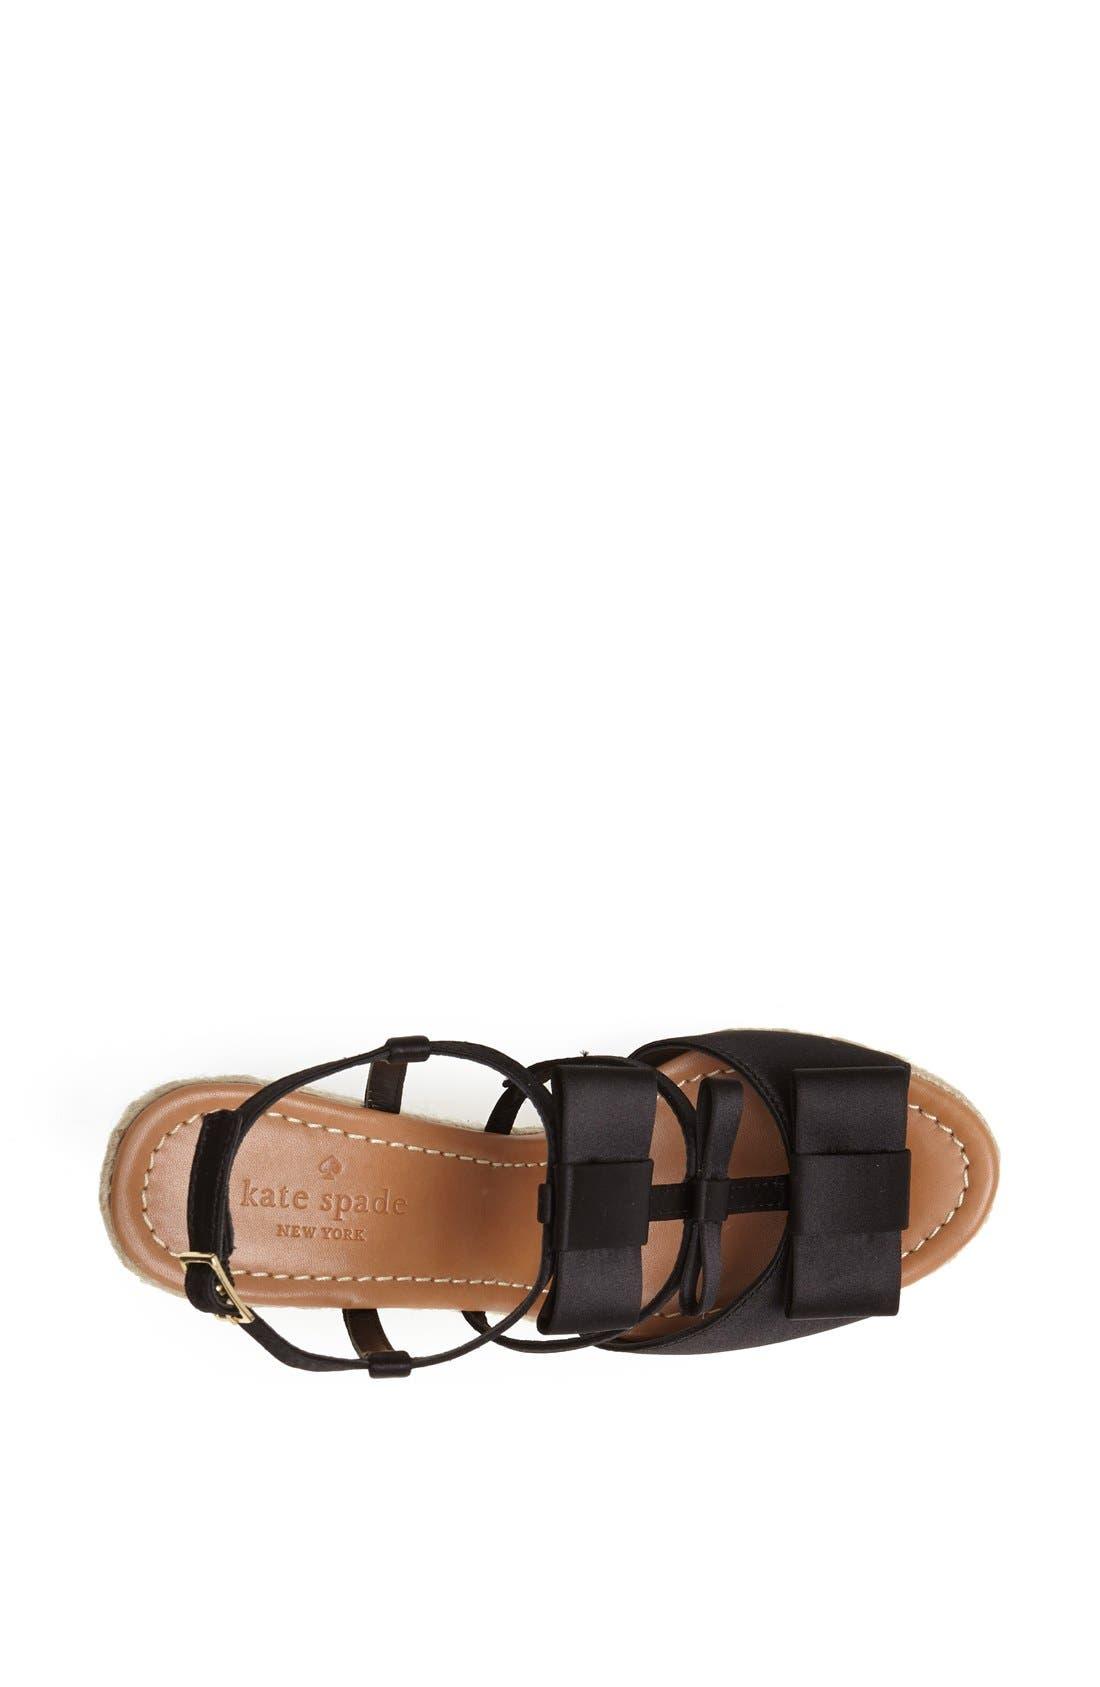 Alternate Image 3  - kate spade new york 'juju' wedge sandal